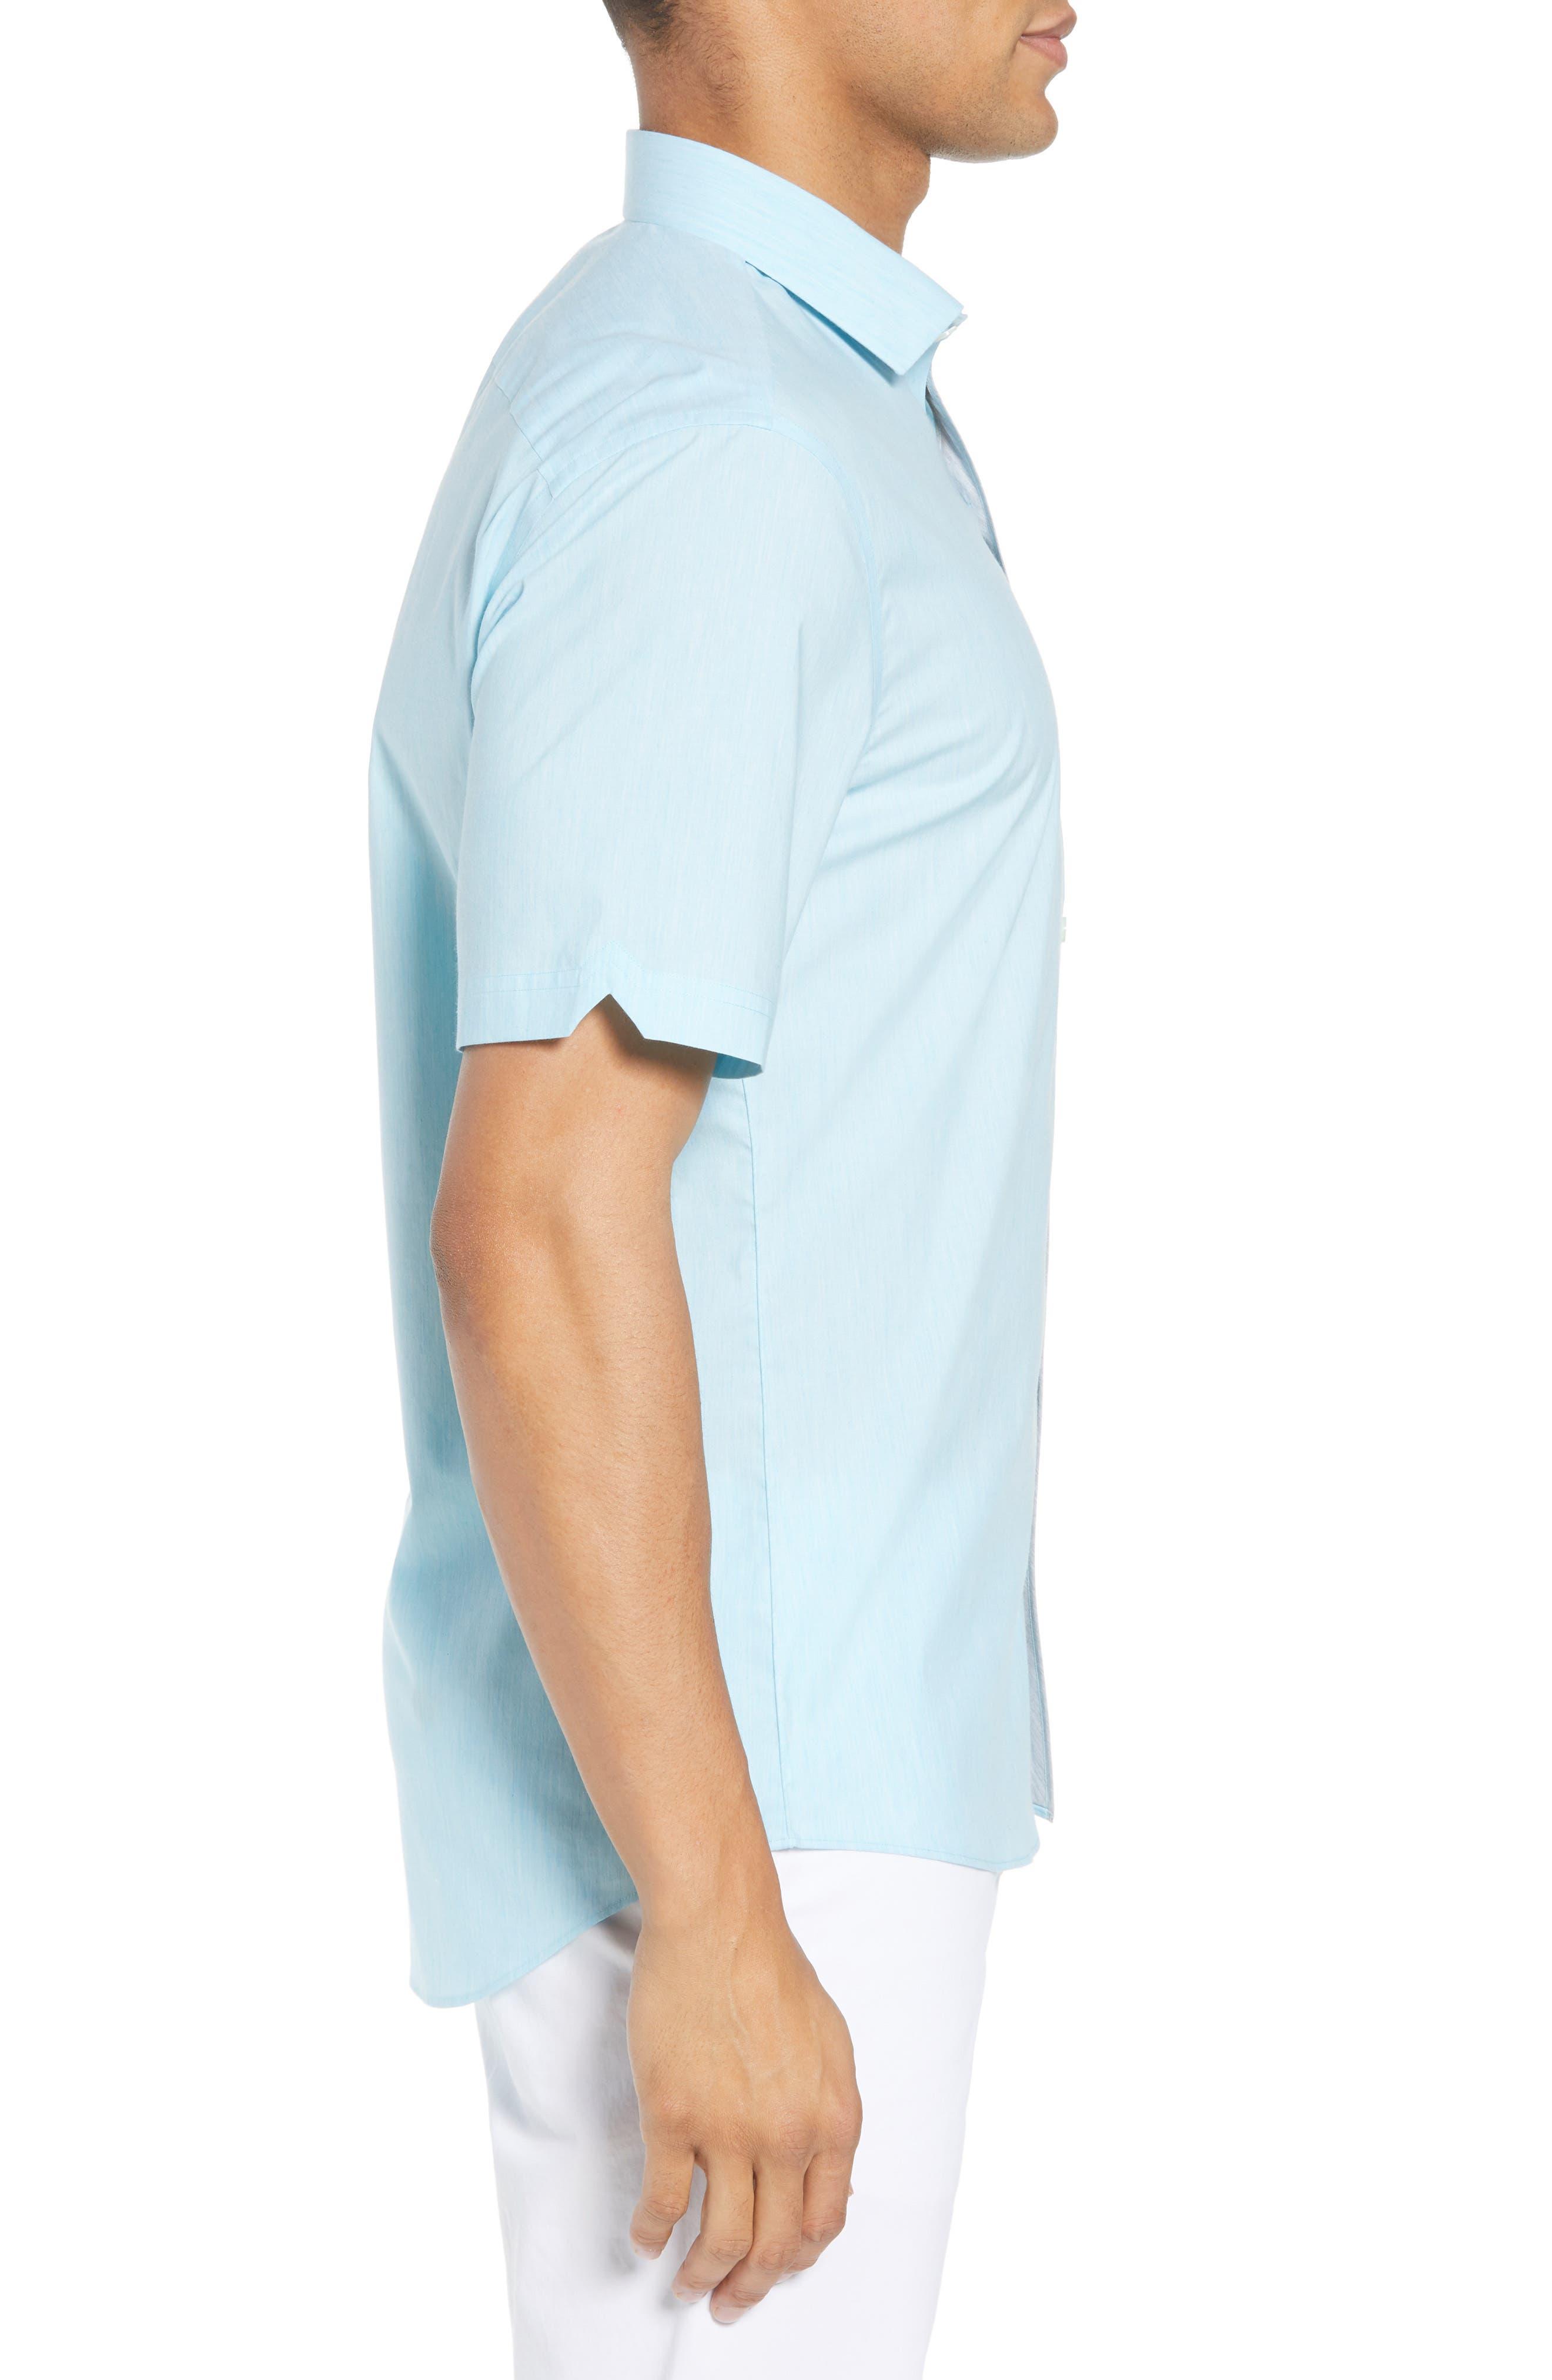 Baumann Slim Fit Sport Shirt,                             Alternate thumbnail 3, color,                             Aqua